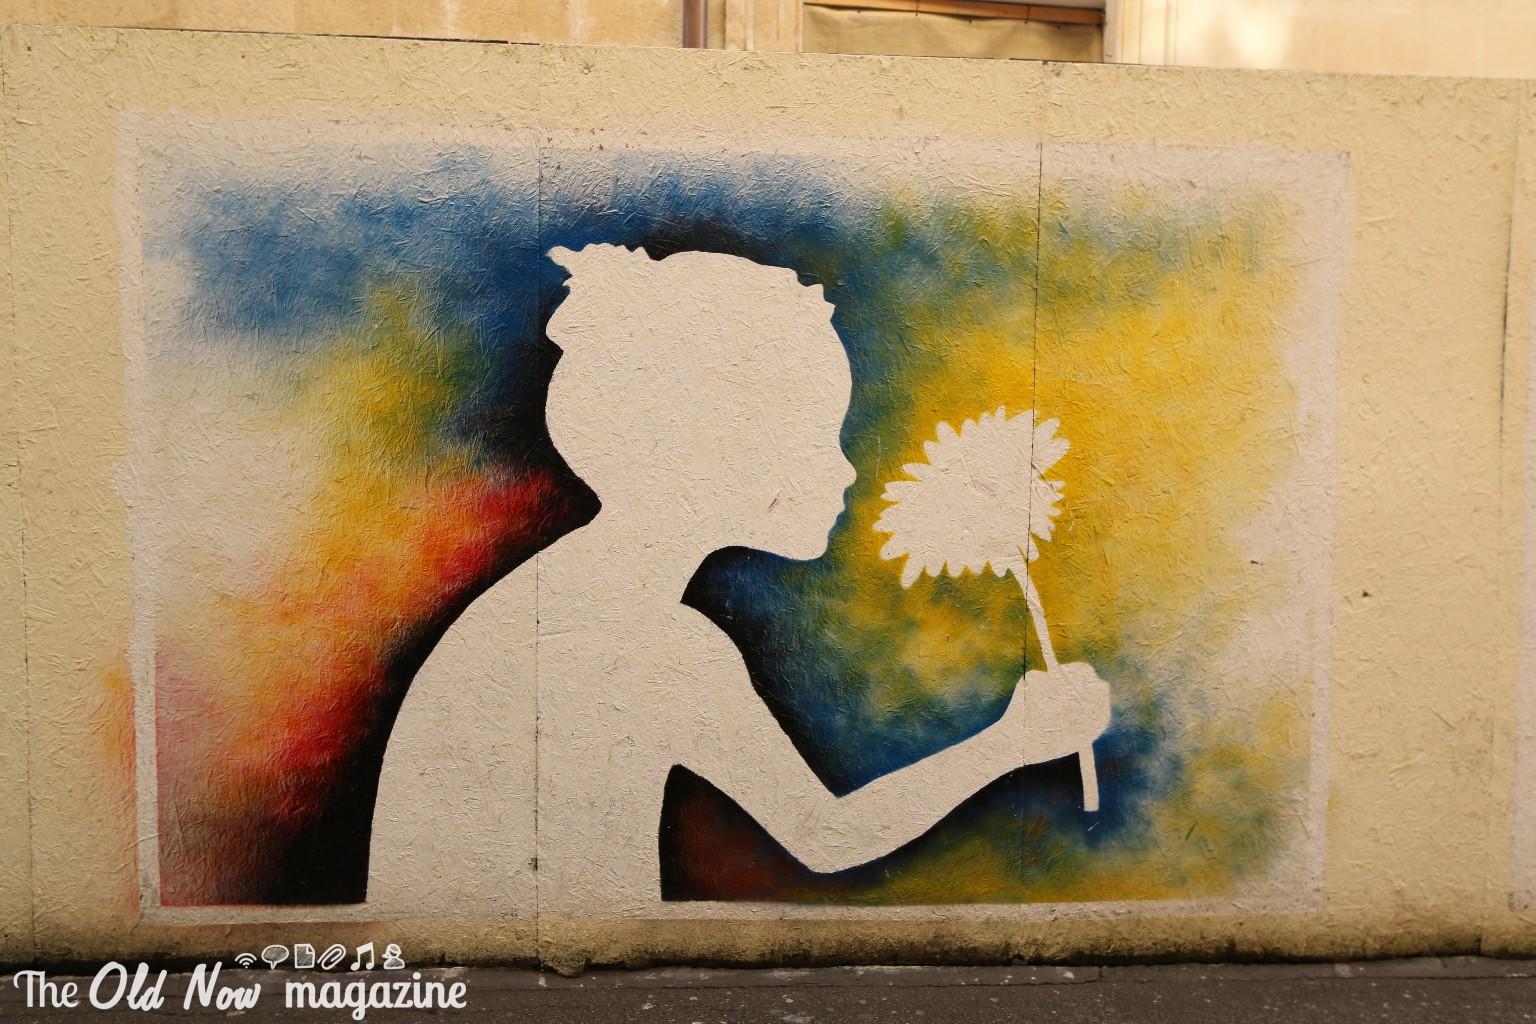 LECCE THEOLDNOW #vediamopositivo (52)